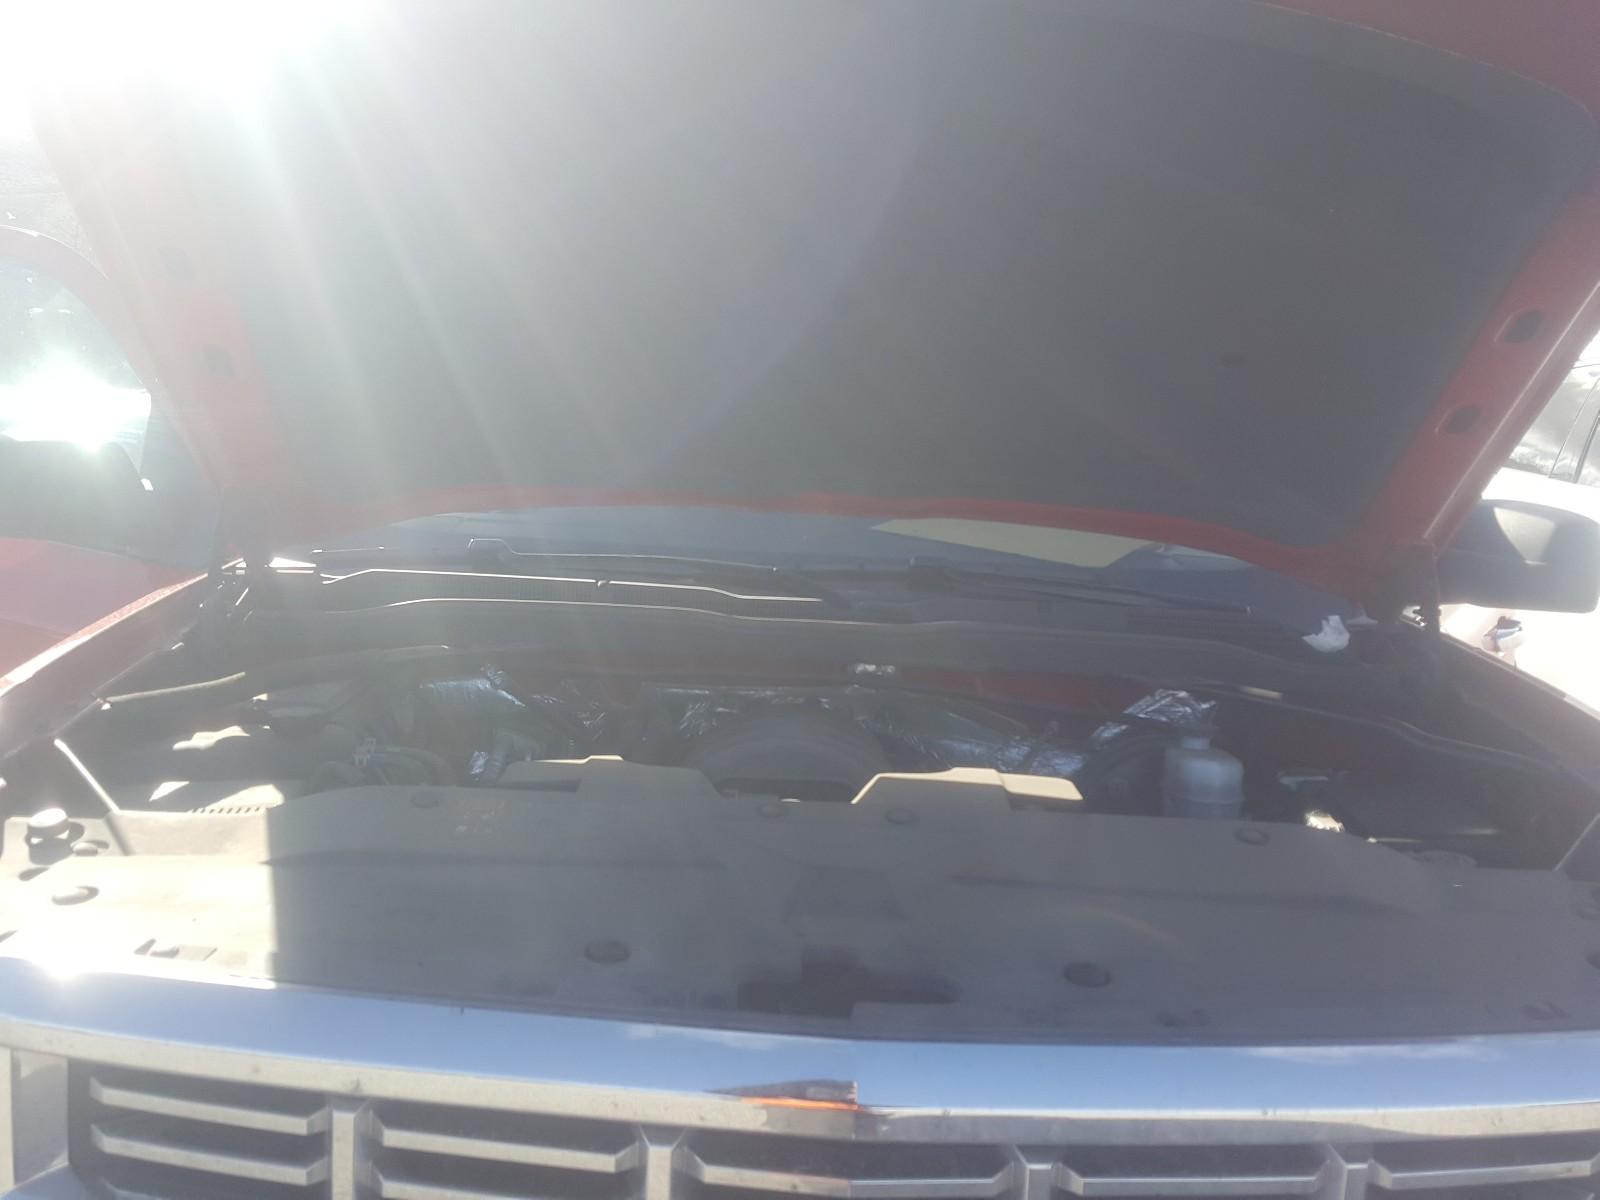 3GCUKREC0EG546934 - 2014 Chevrolet Silverado 5.3L inside view